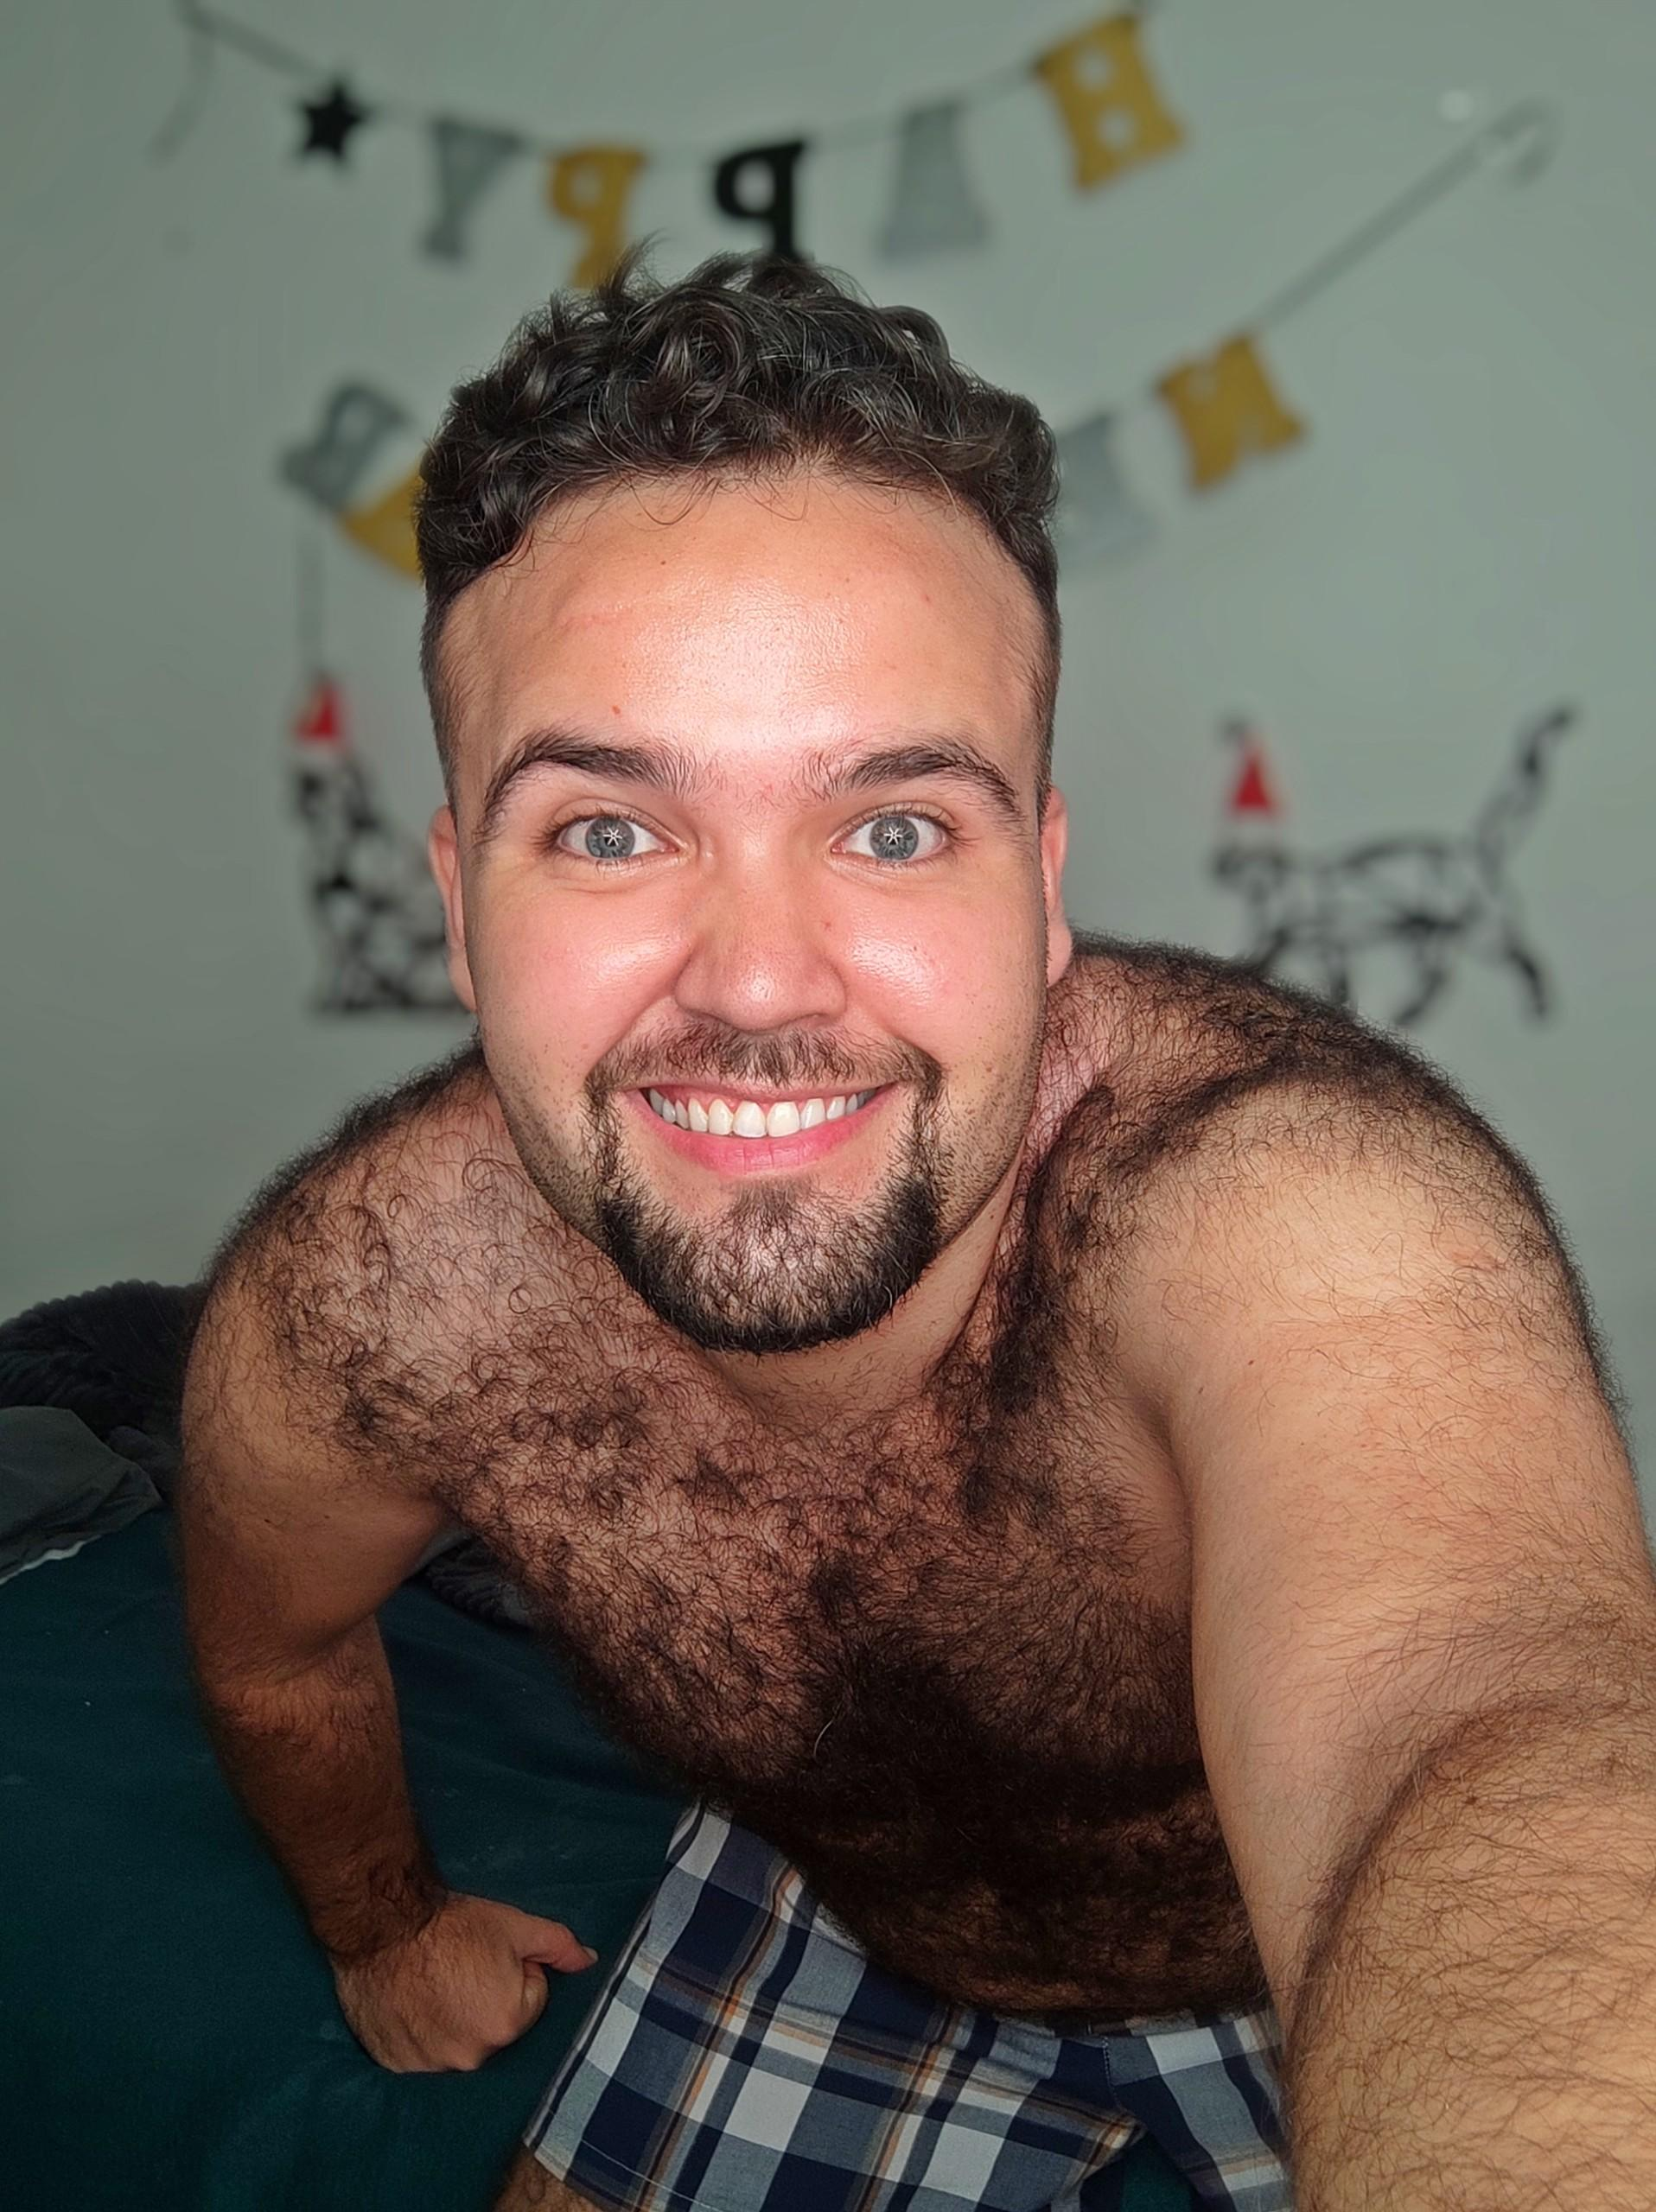 Werewolfm?s=soovdcx0wcsvmzv9inzjysjrlyyons7llqtwotrvfz4=